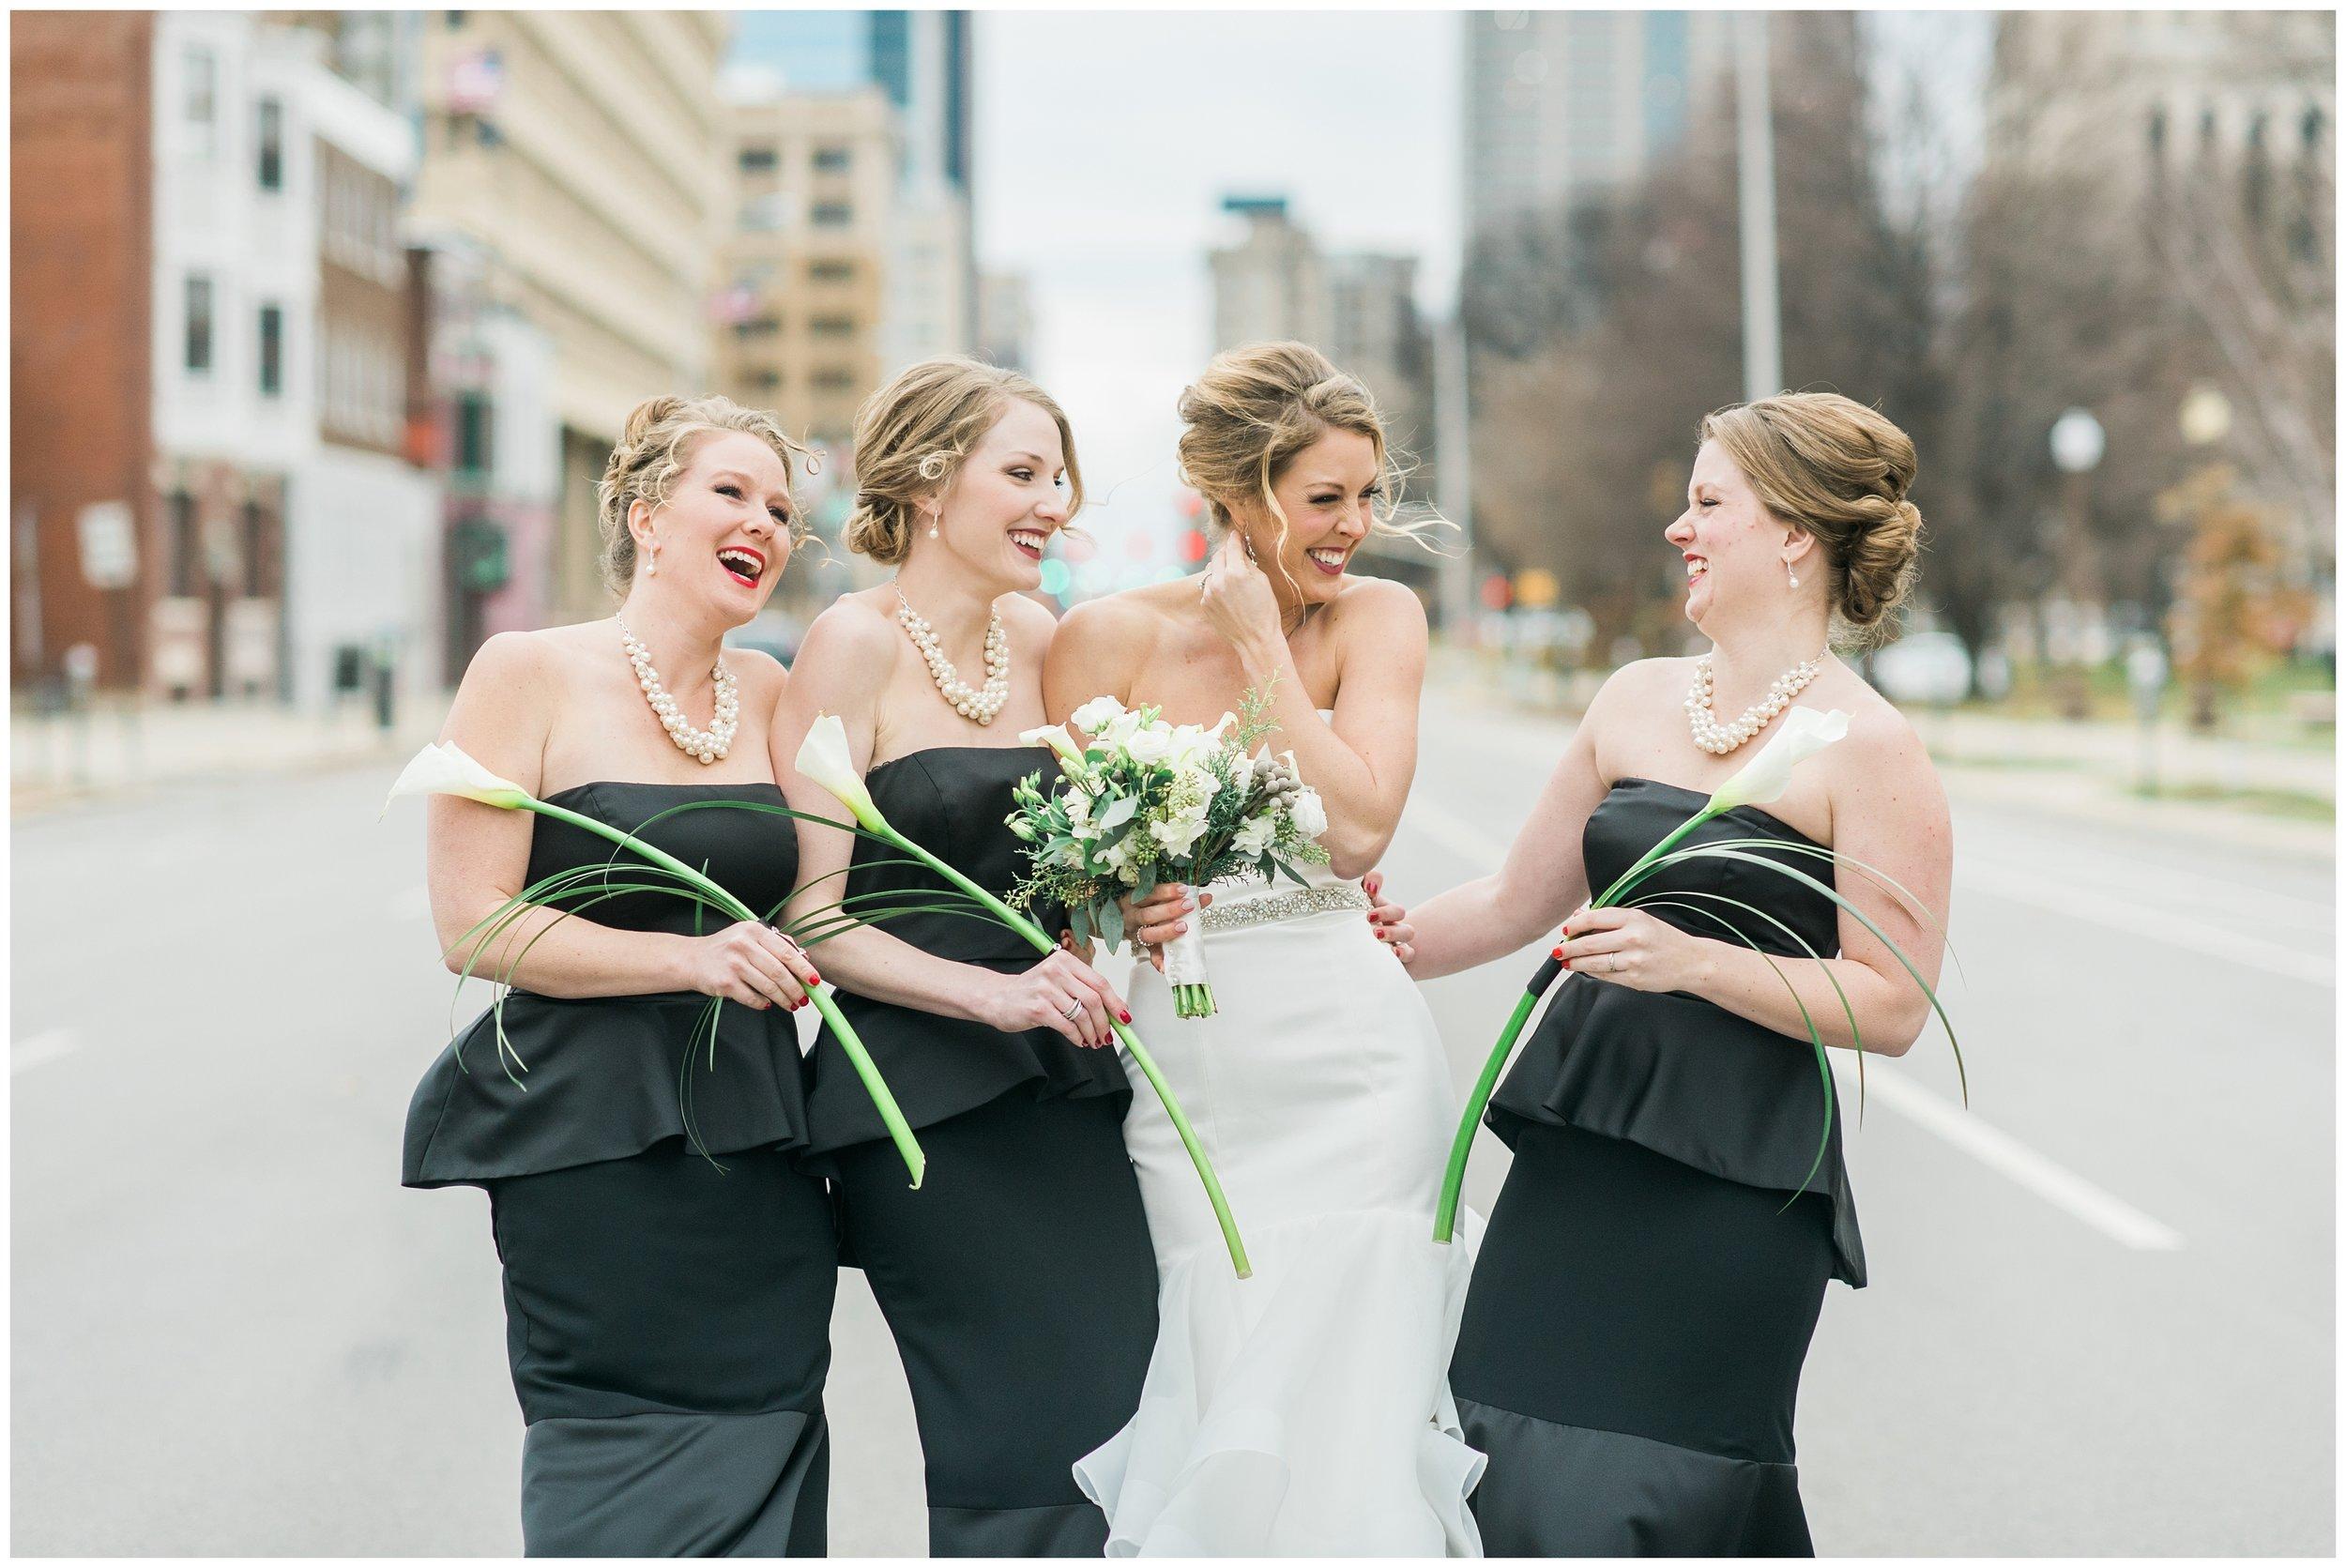 Rebecca_Bridges_Photography_Indianapolis_Wedding_Photographer_5814.jpg